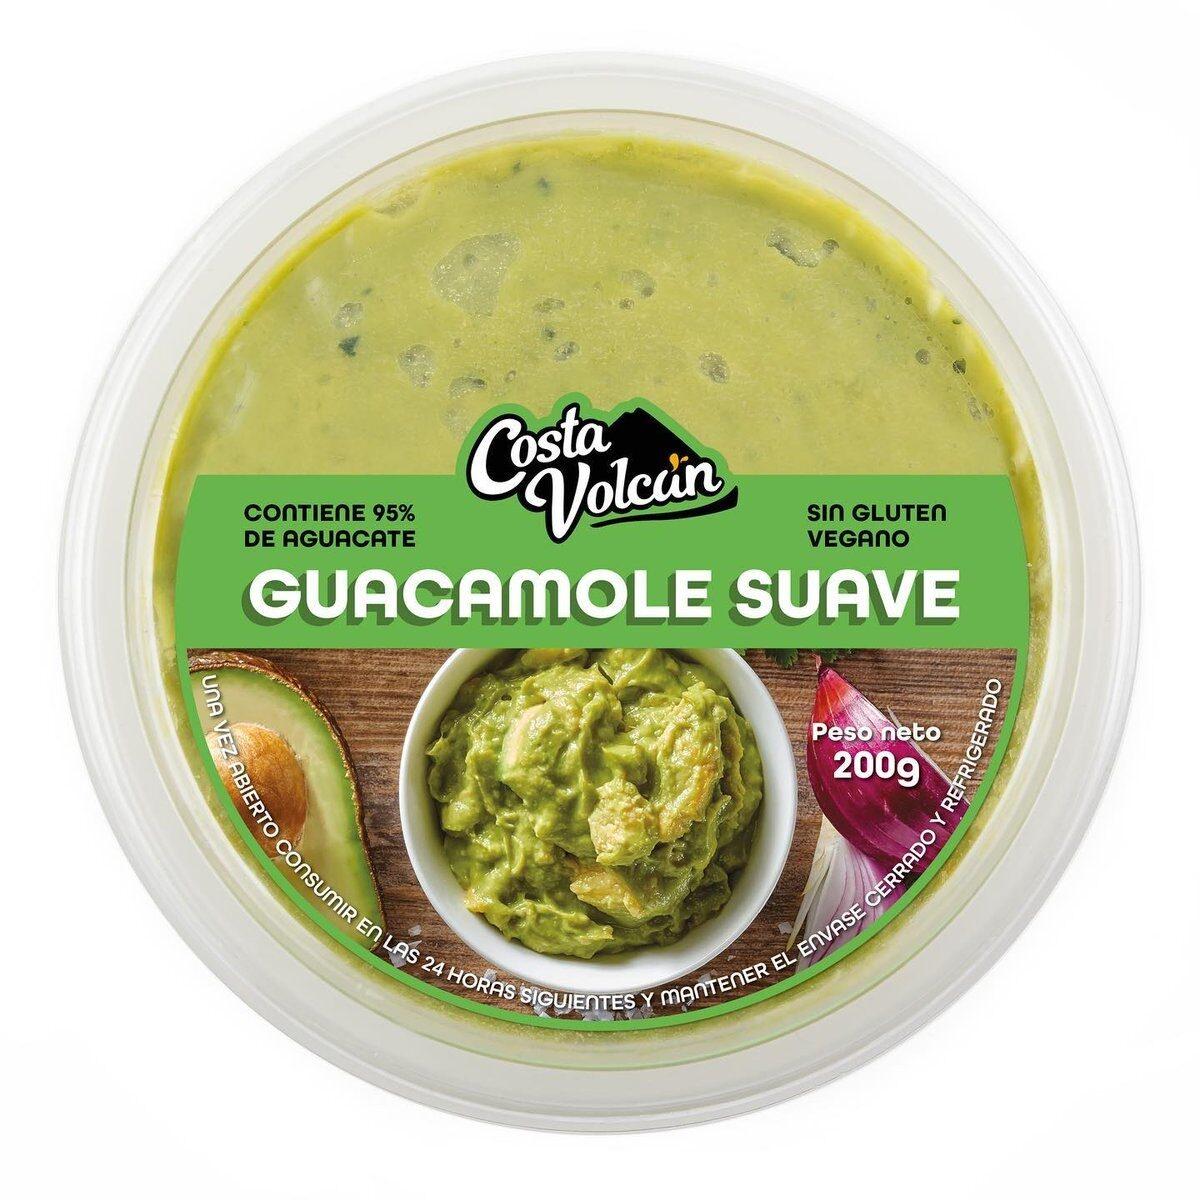 Guacamole suave - Product